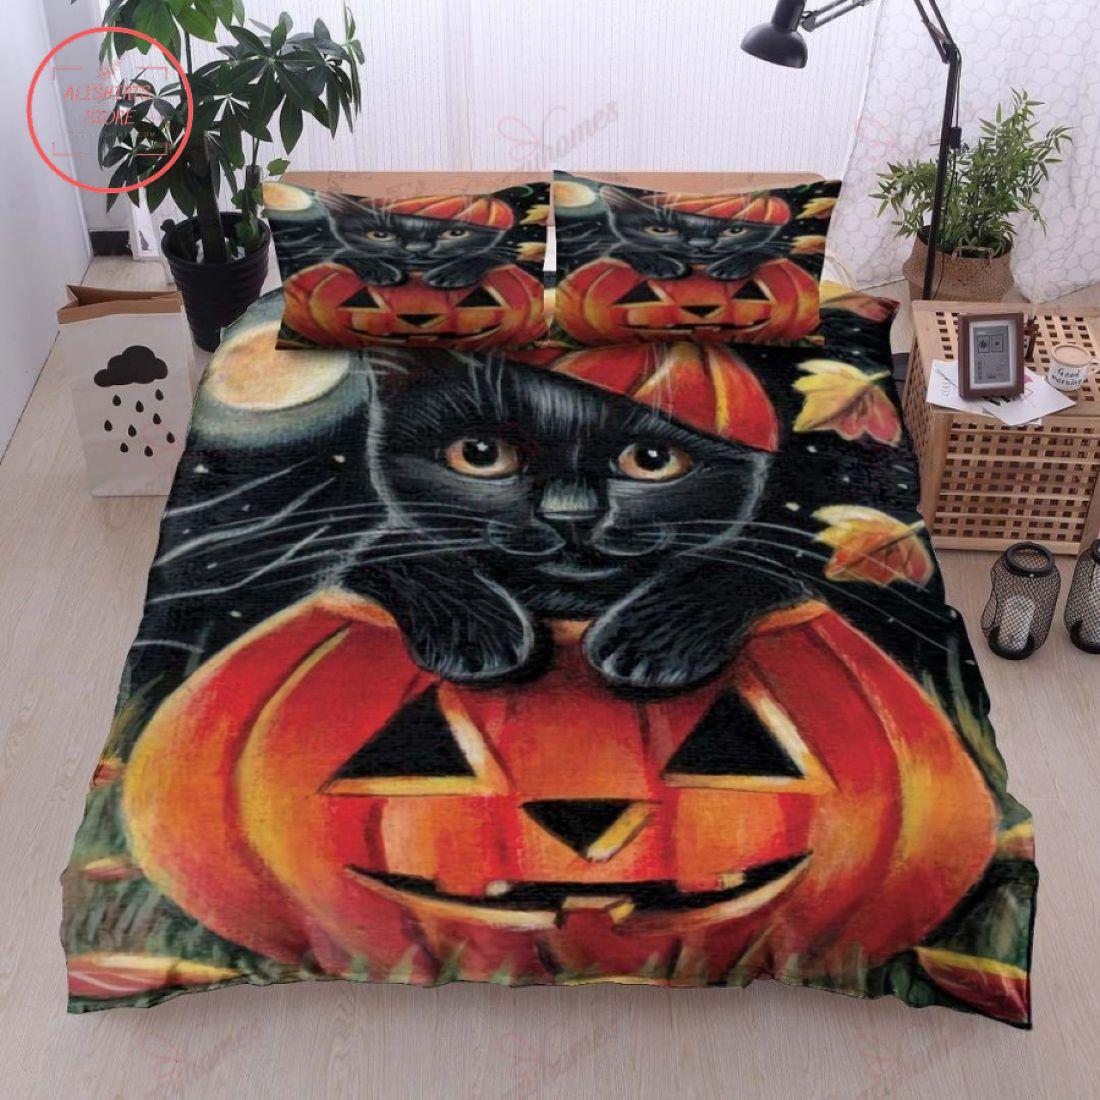 Cute Black Cat In Pumpkin Halloween Blanket